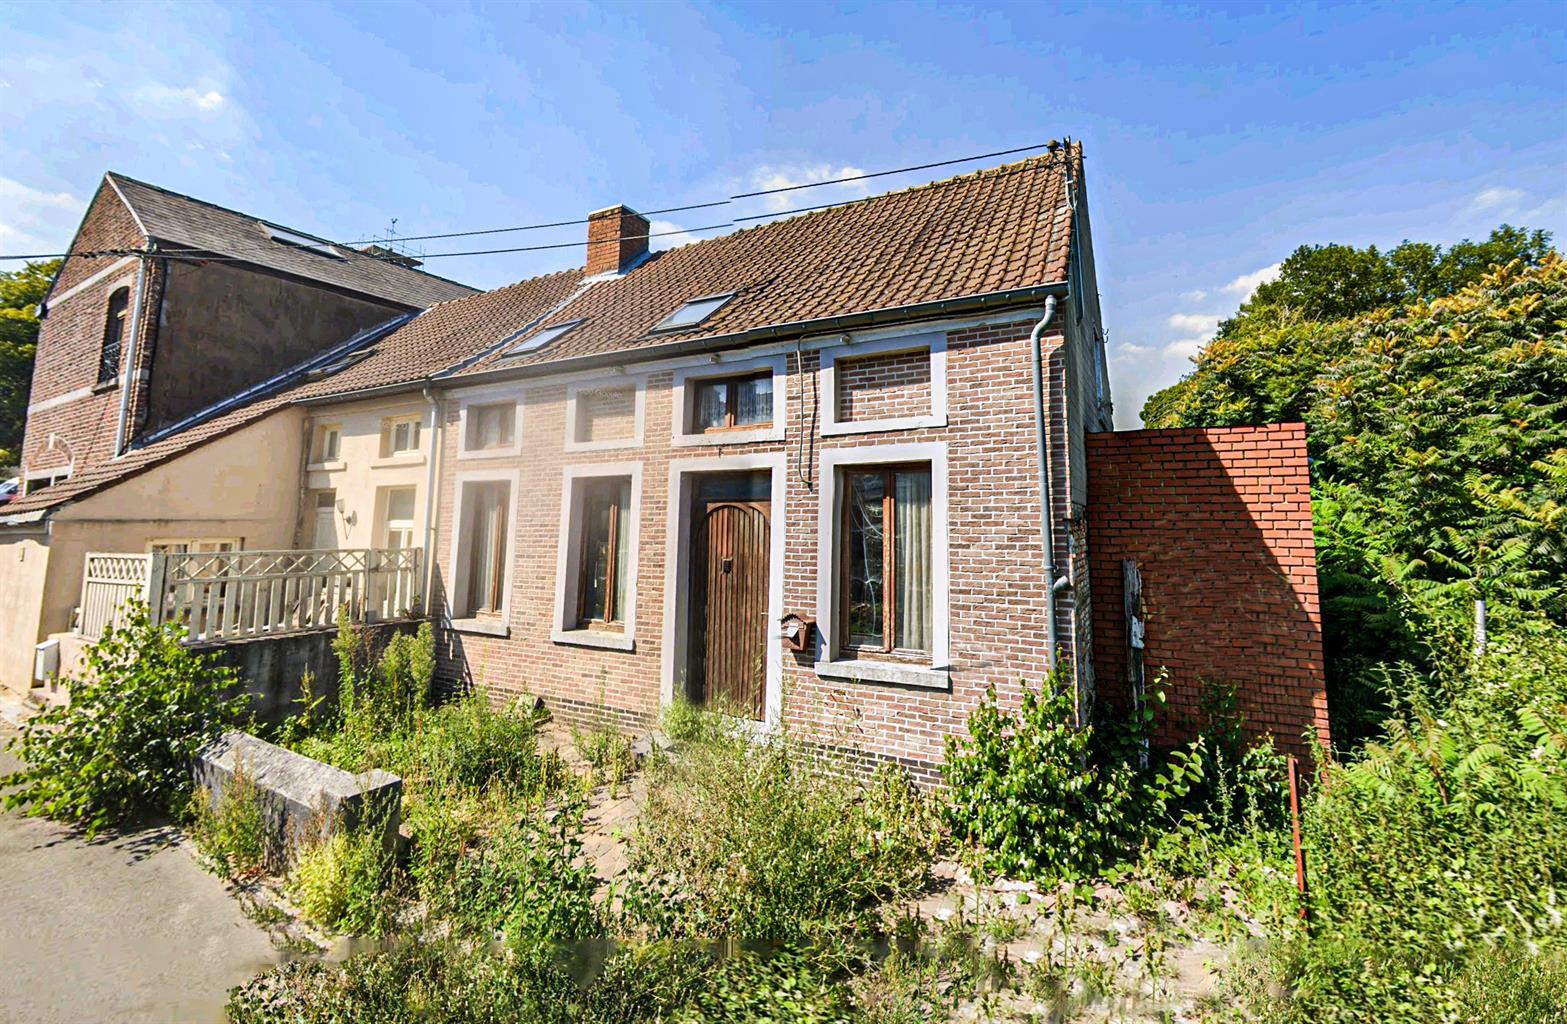 Maison - Tubize Oisquercq - #4500506-0